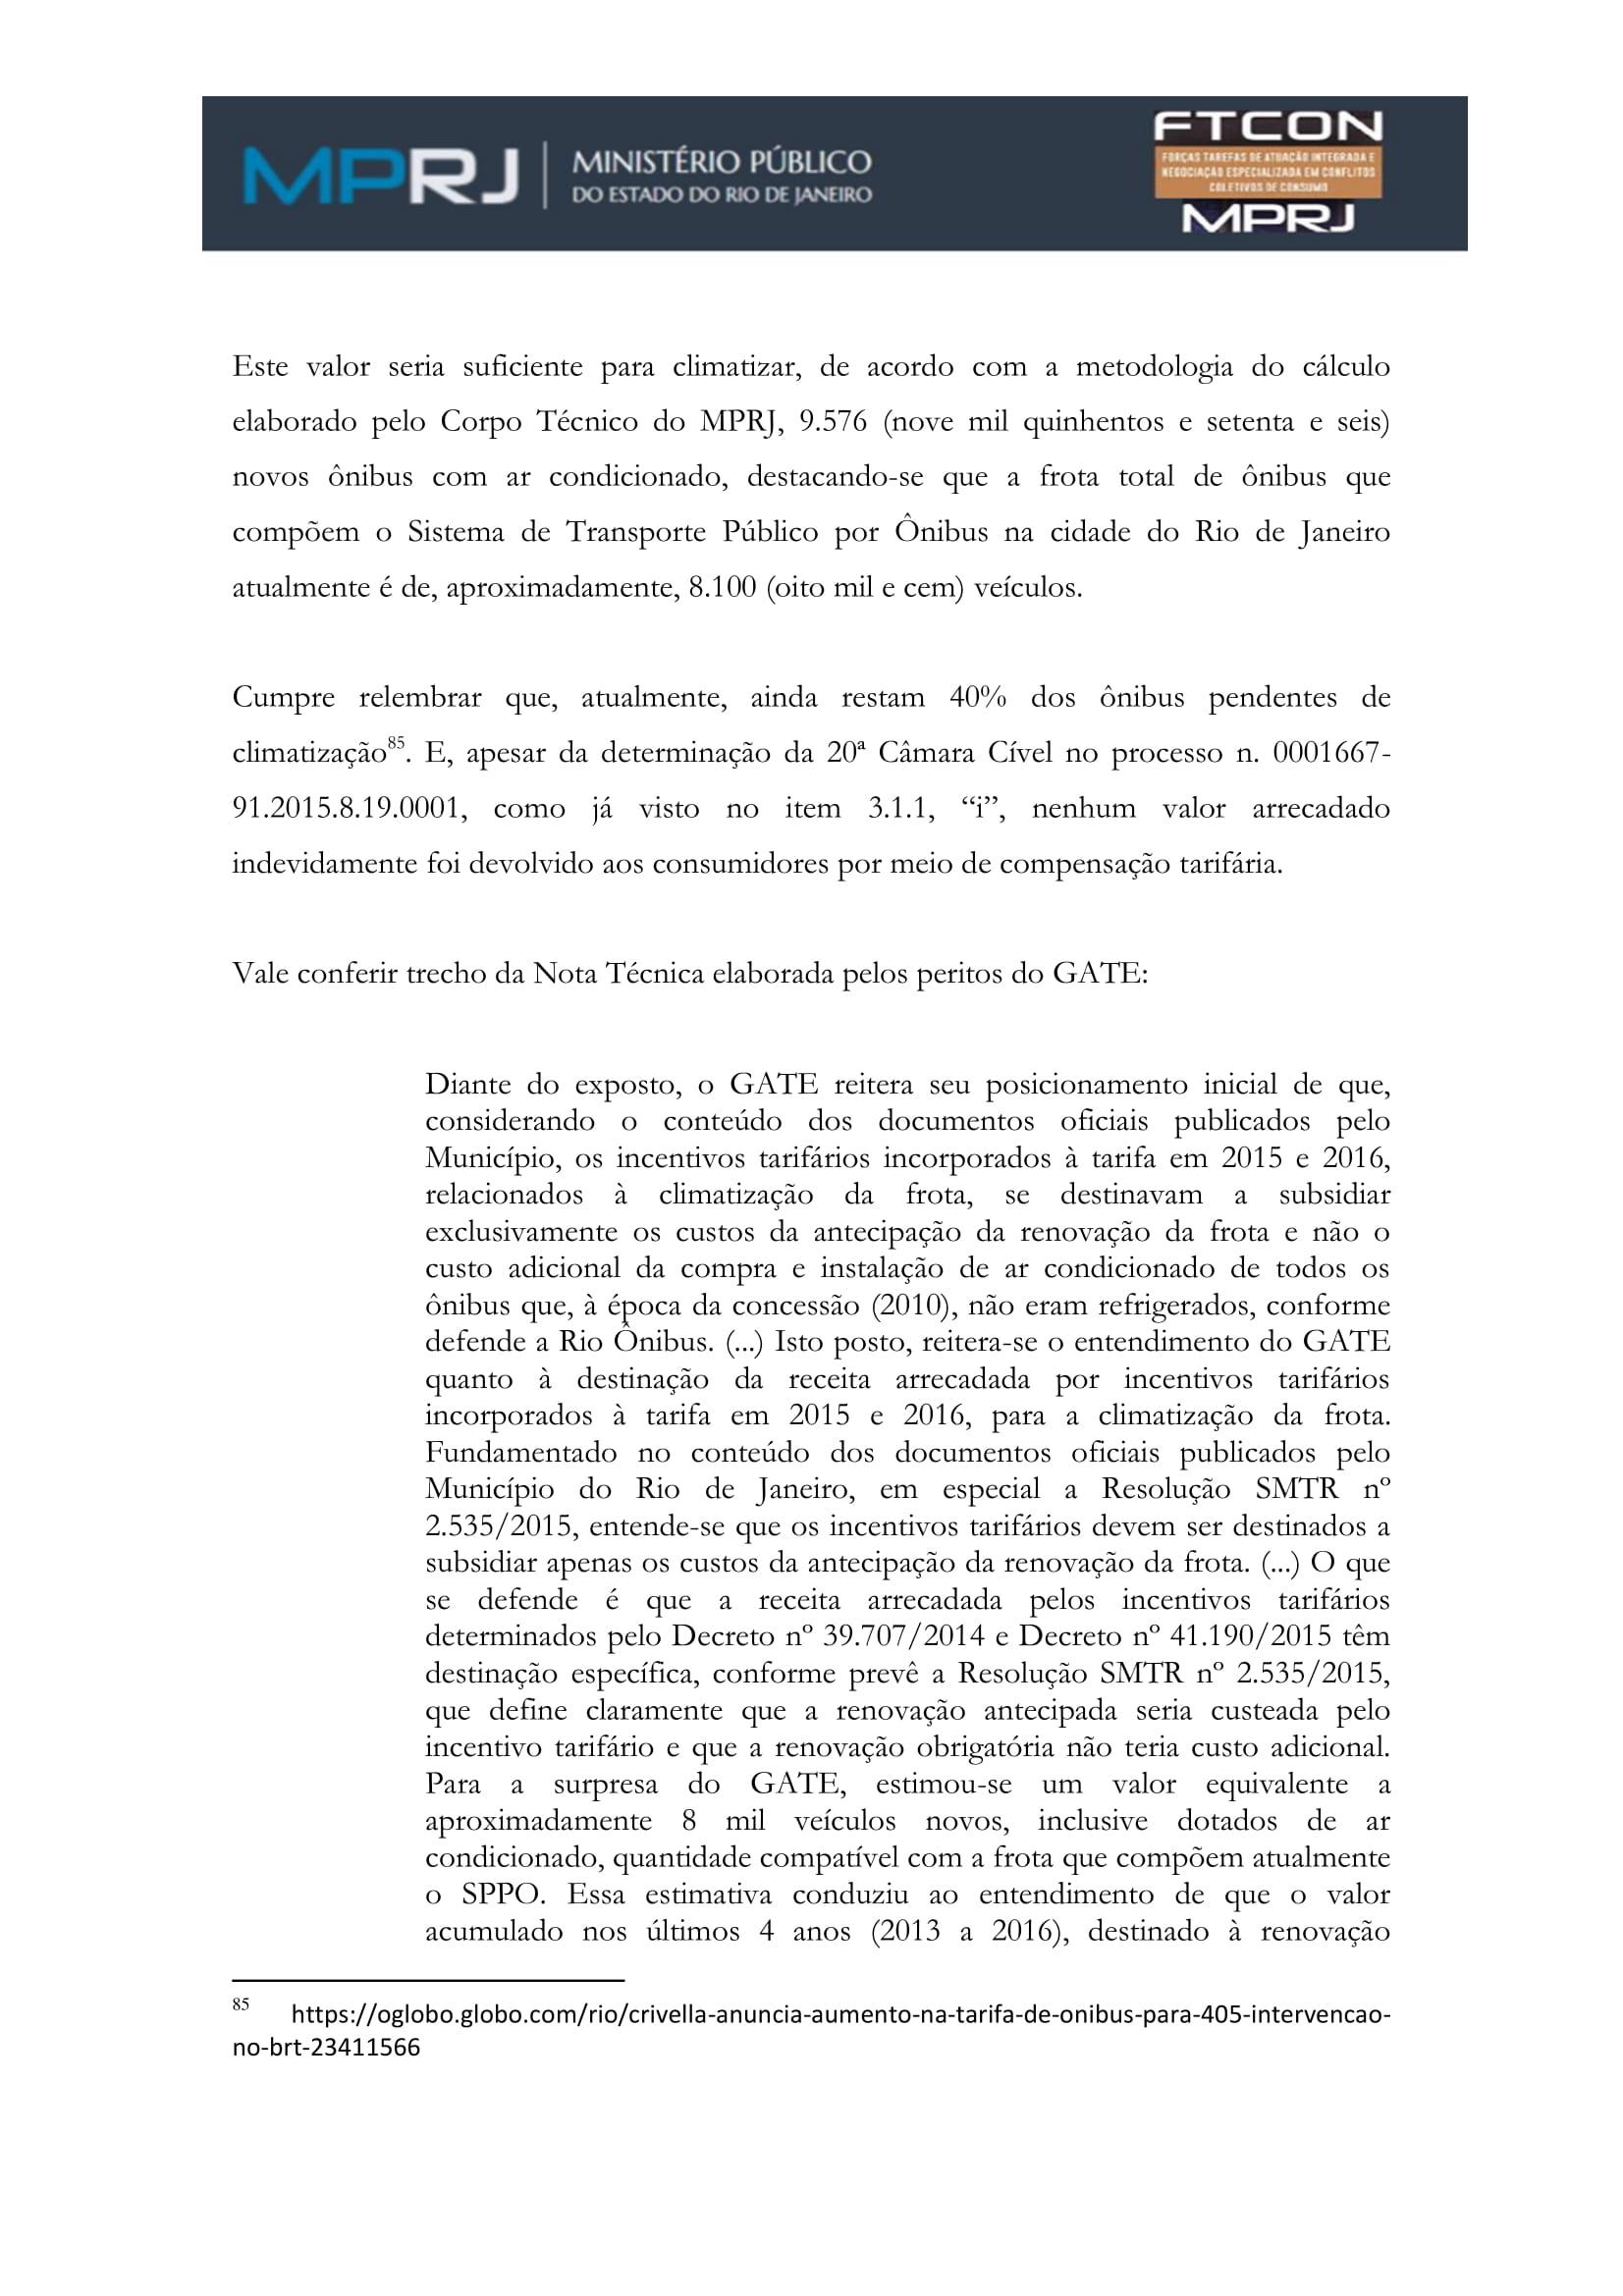 acp_caducidade_onibus_dr_rt-094